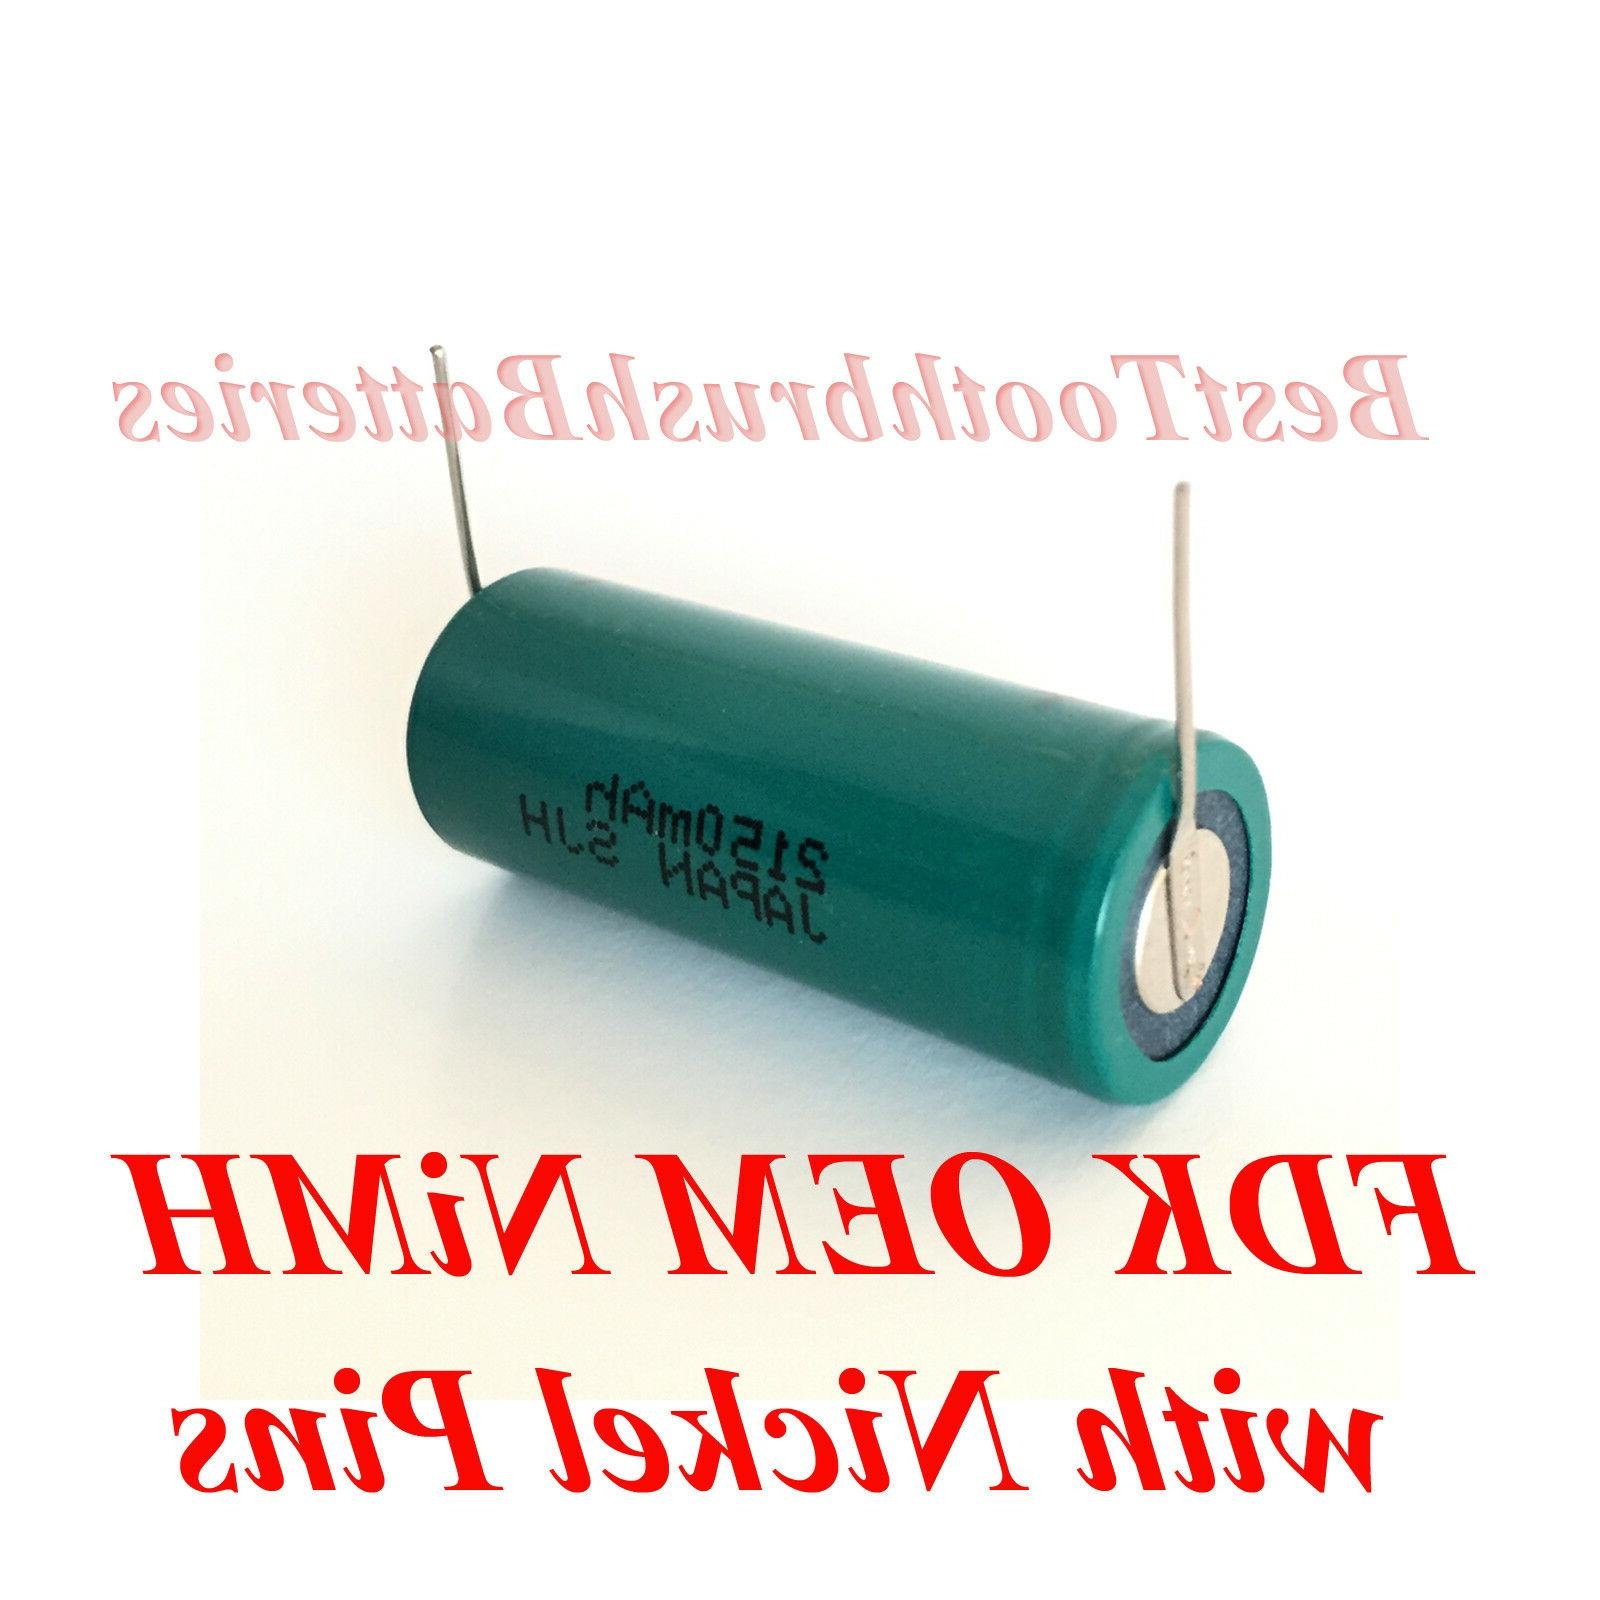 Sonicare Elite Toothbrush Replacement Repair Battery FDK 215